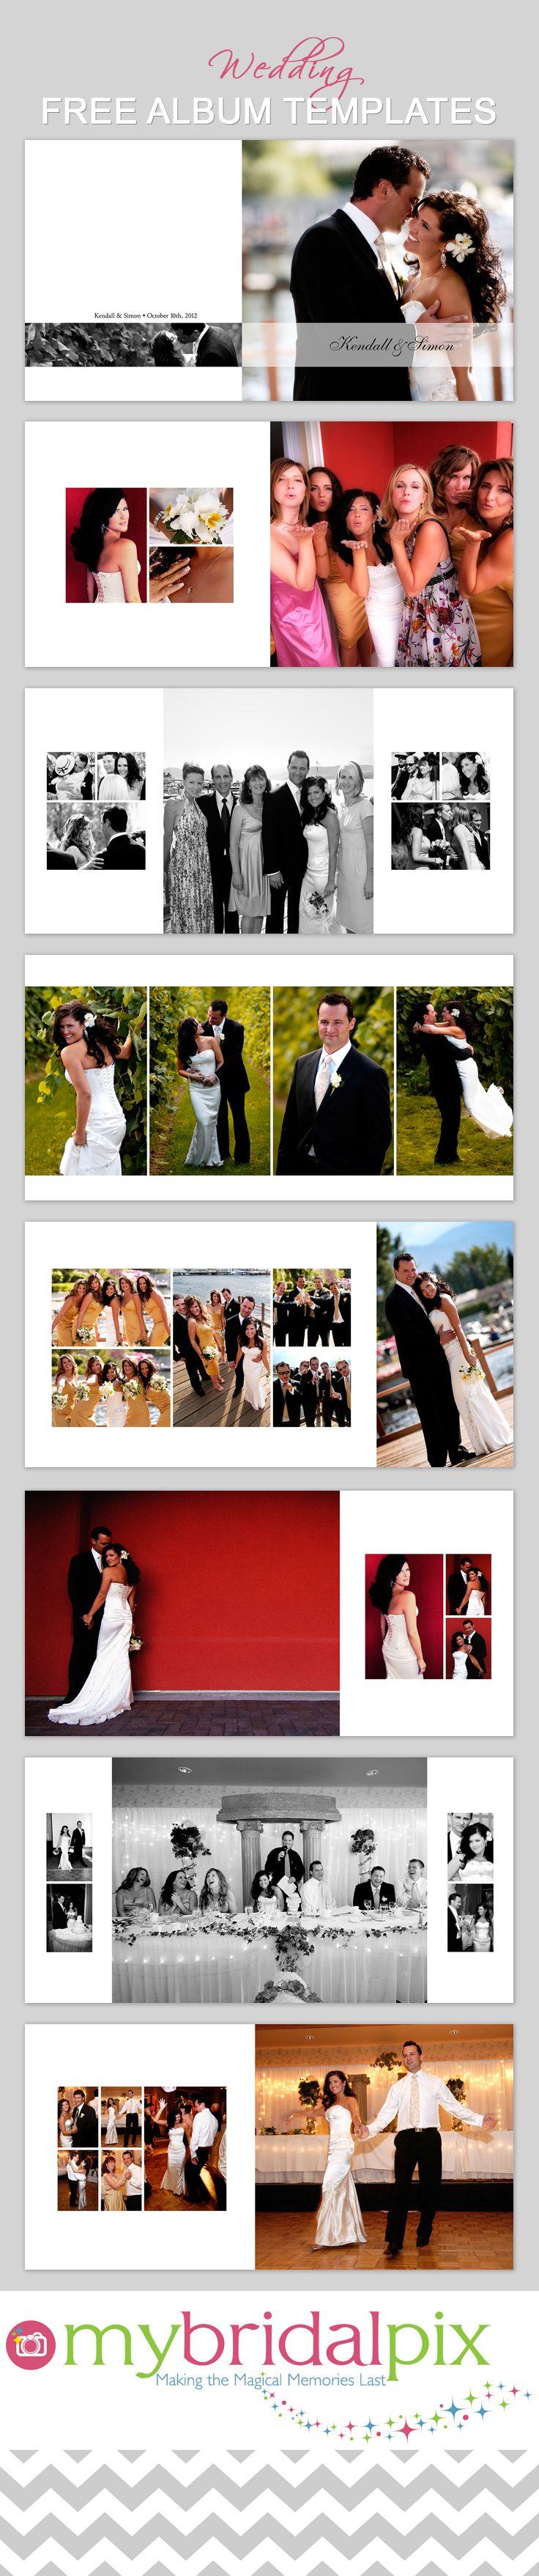 Free wedding album templates at bridalpix wedding album